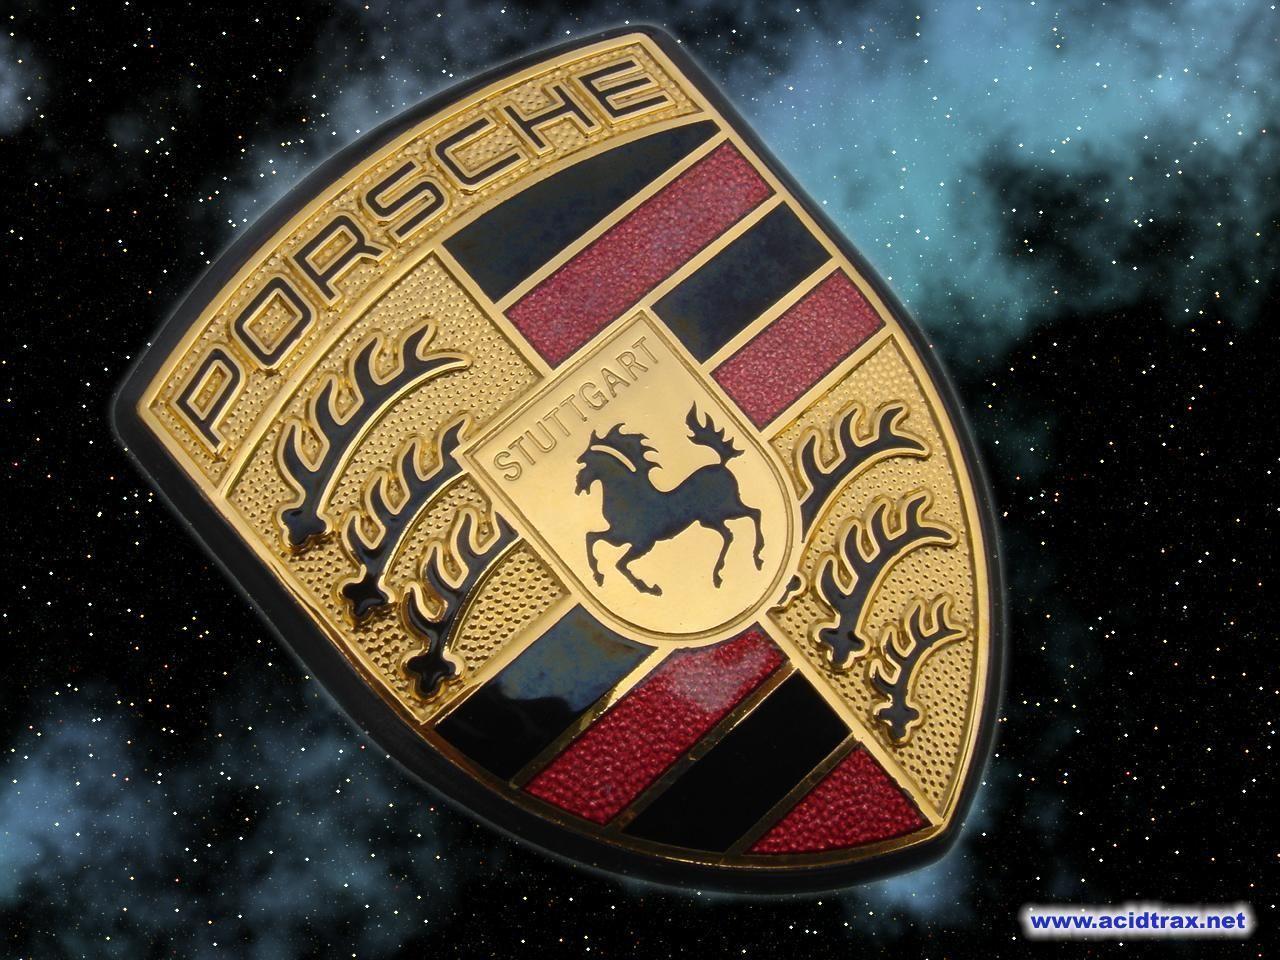 Porsche Car Full HD Wallpapers Free Download (41) http